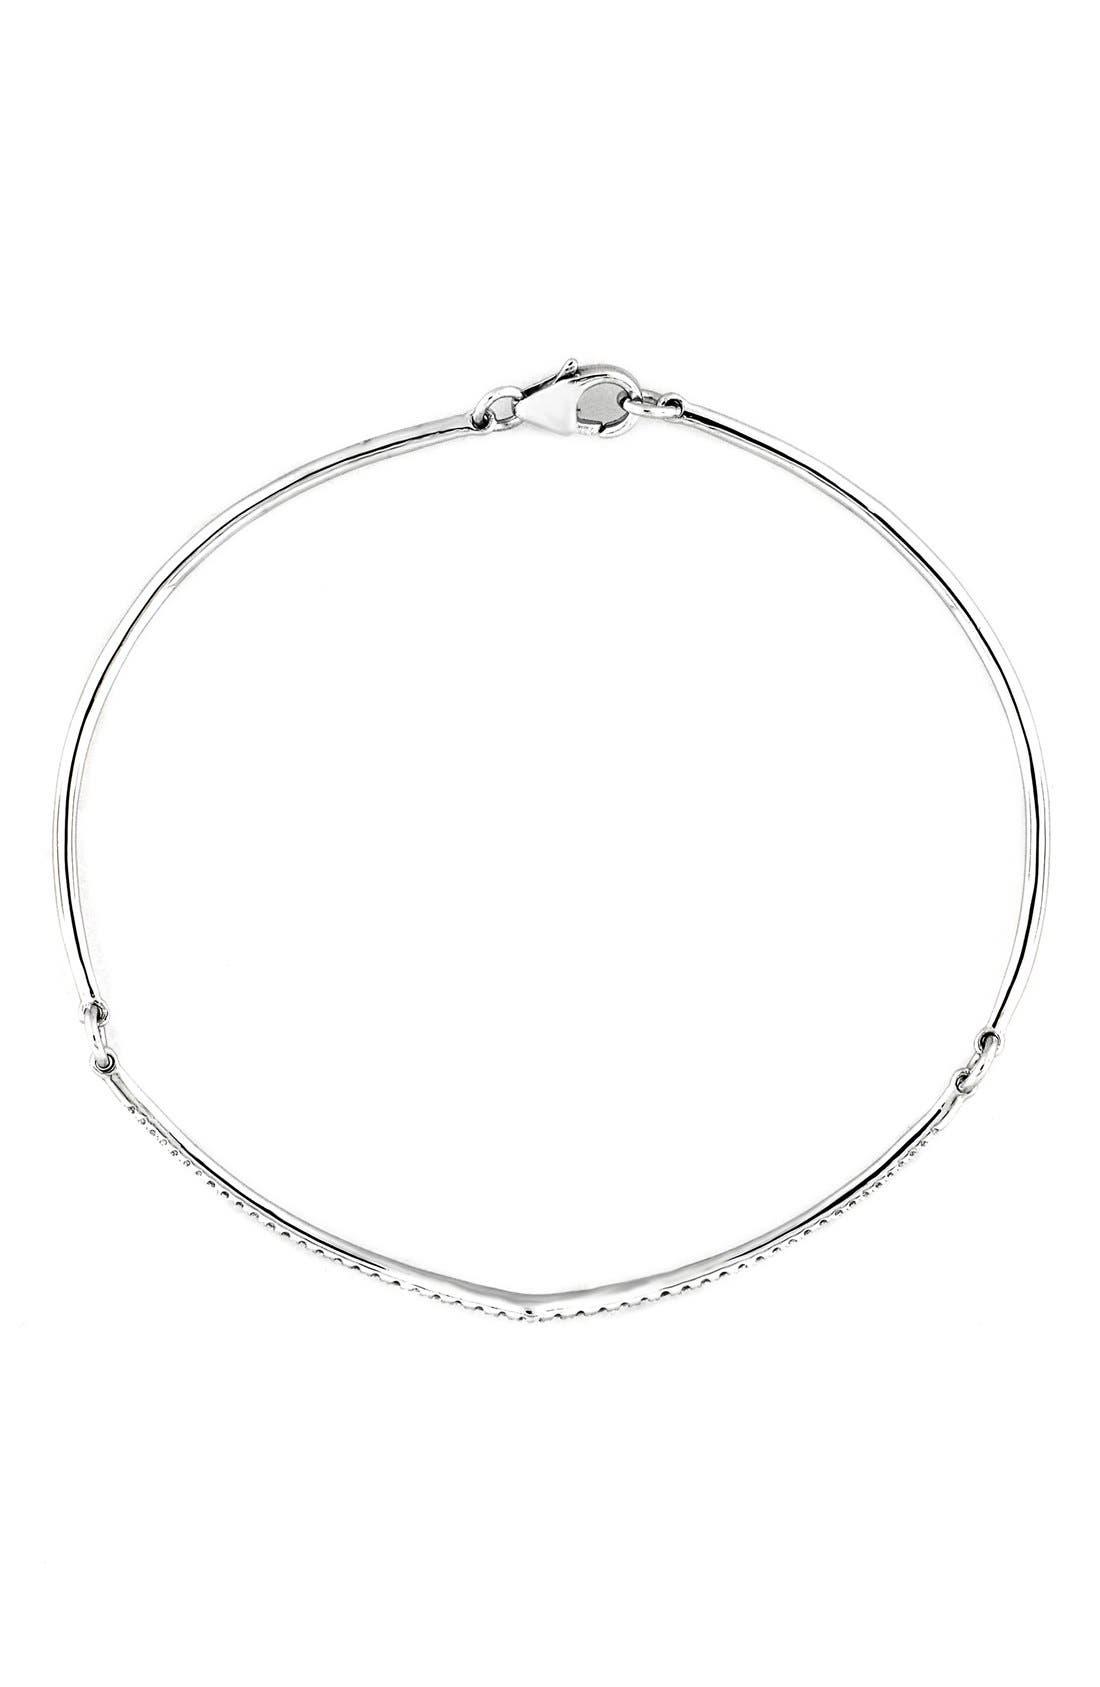 Main Image - Bony Levy Pavé Diamond Bangle Bracelet (Nordstrom Exclusive)